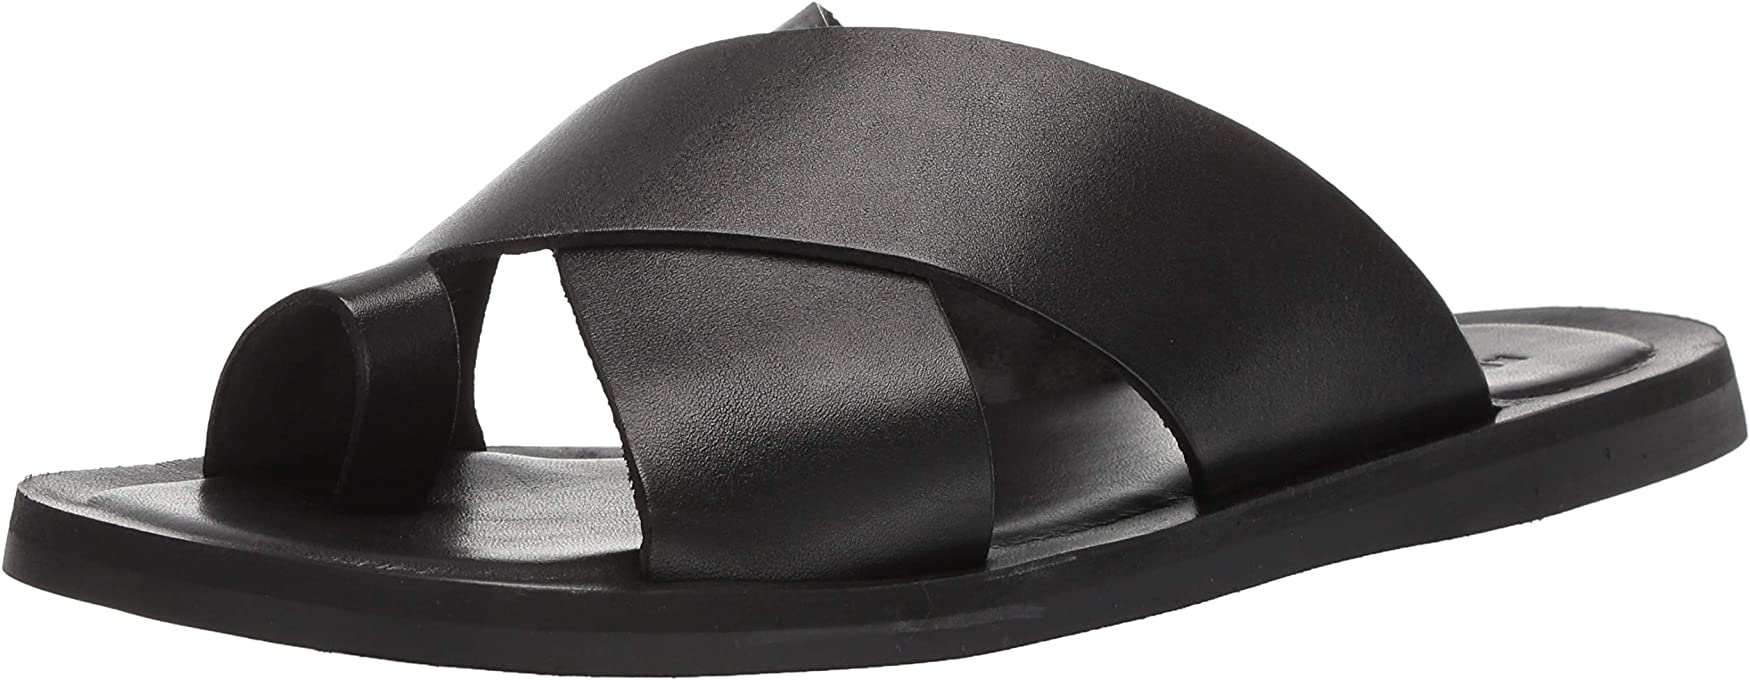 Kenneth Cole New York Mens KMS9043LE Ideal Sandal B